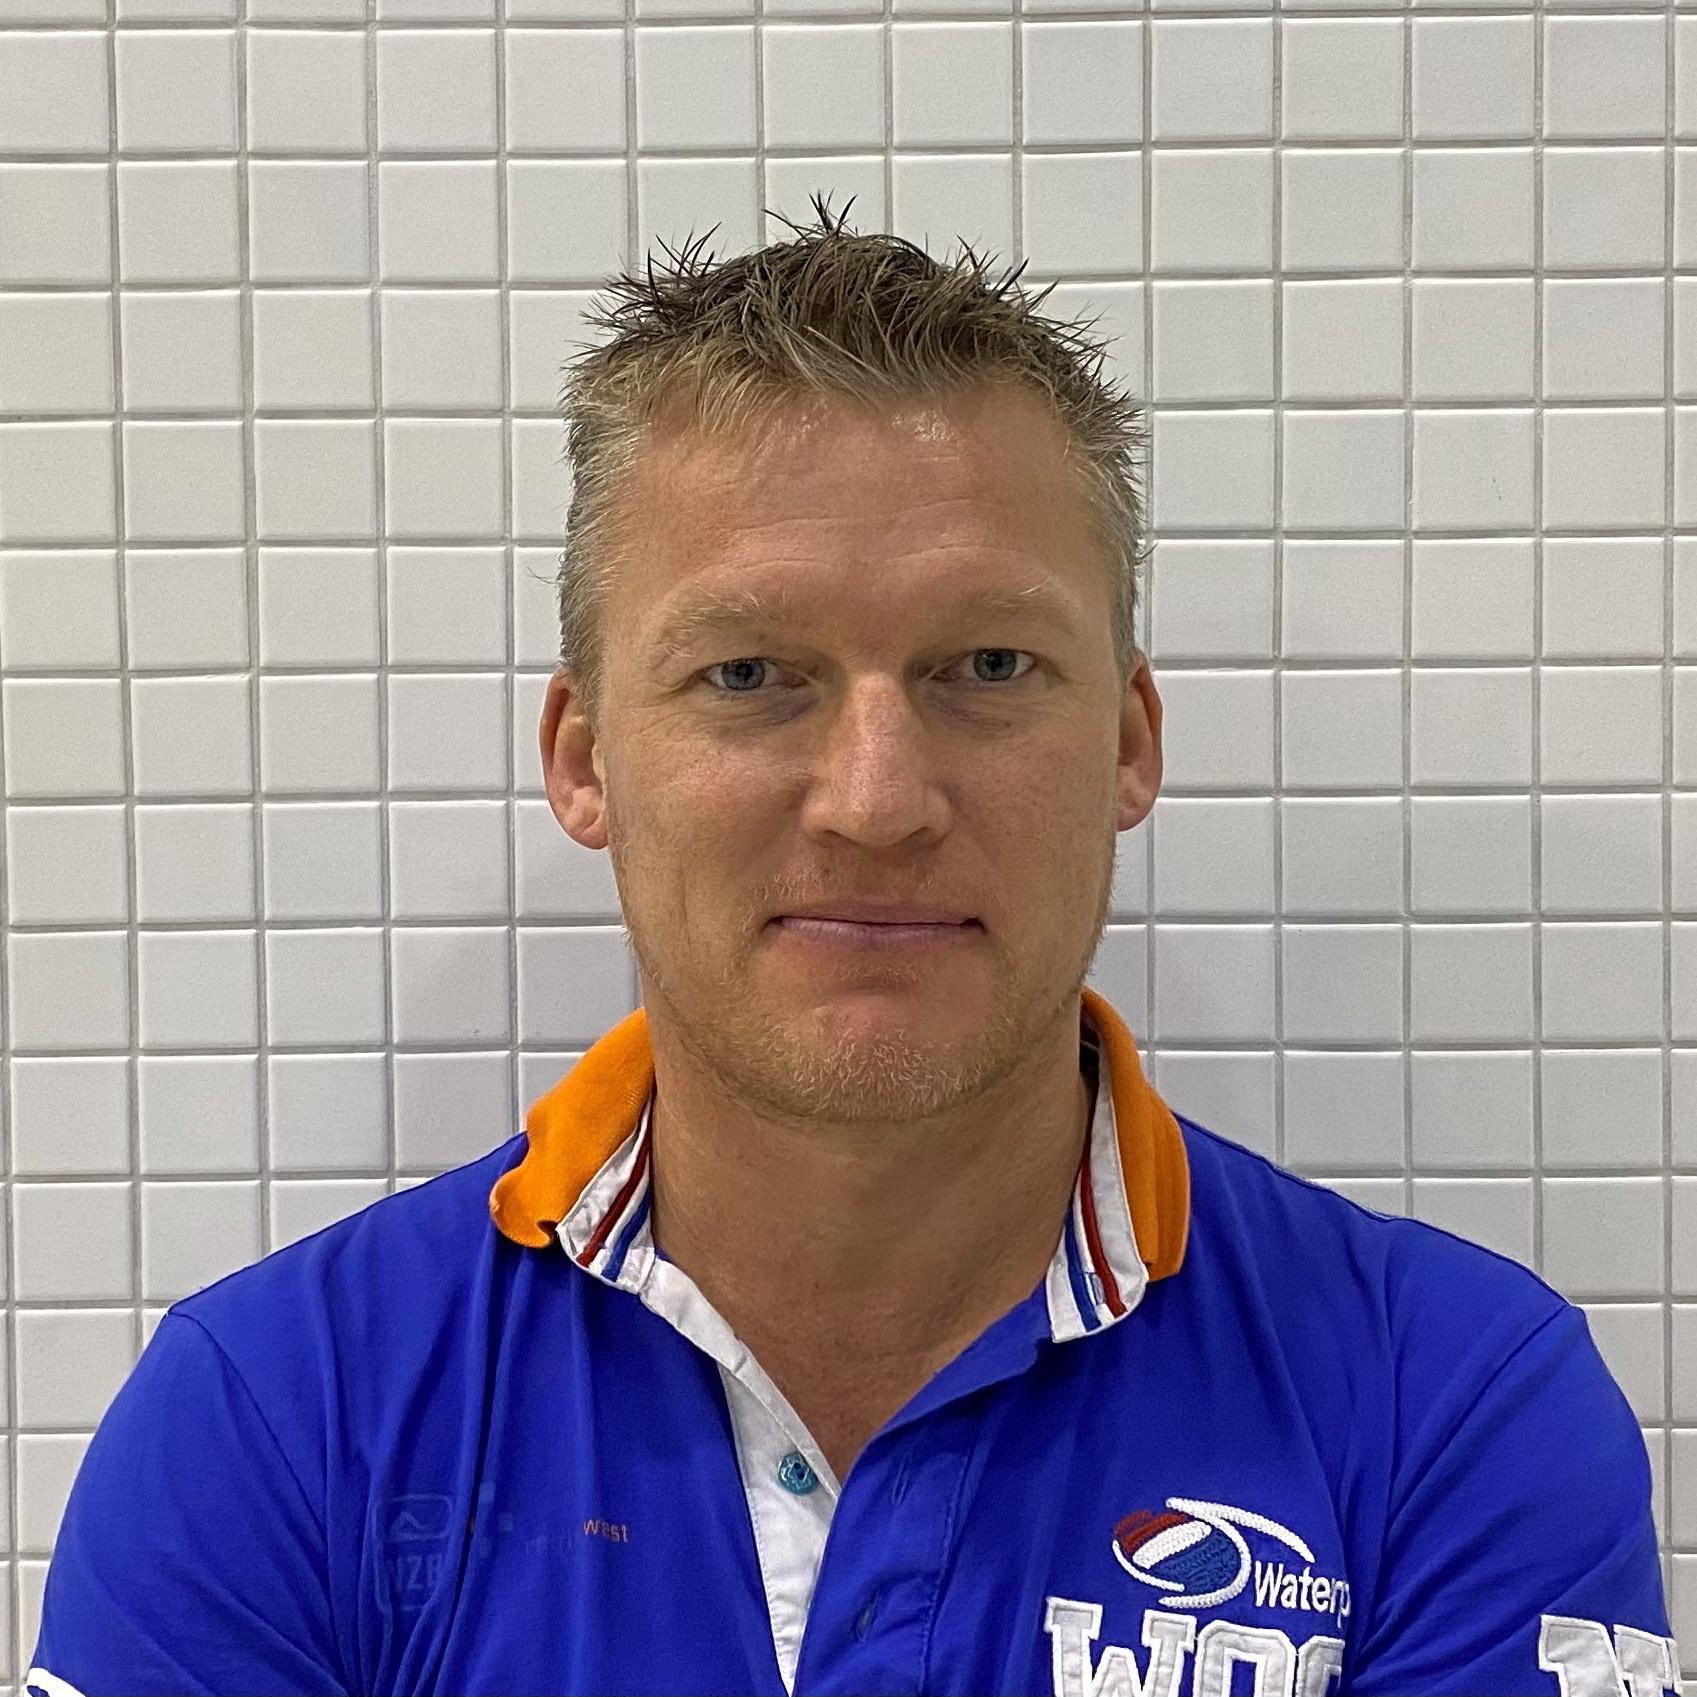 Peter Bergenhenegouwen